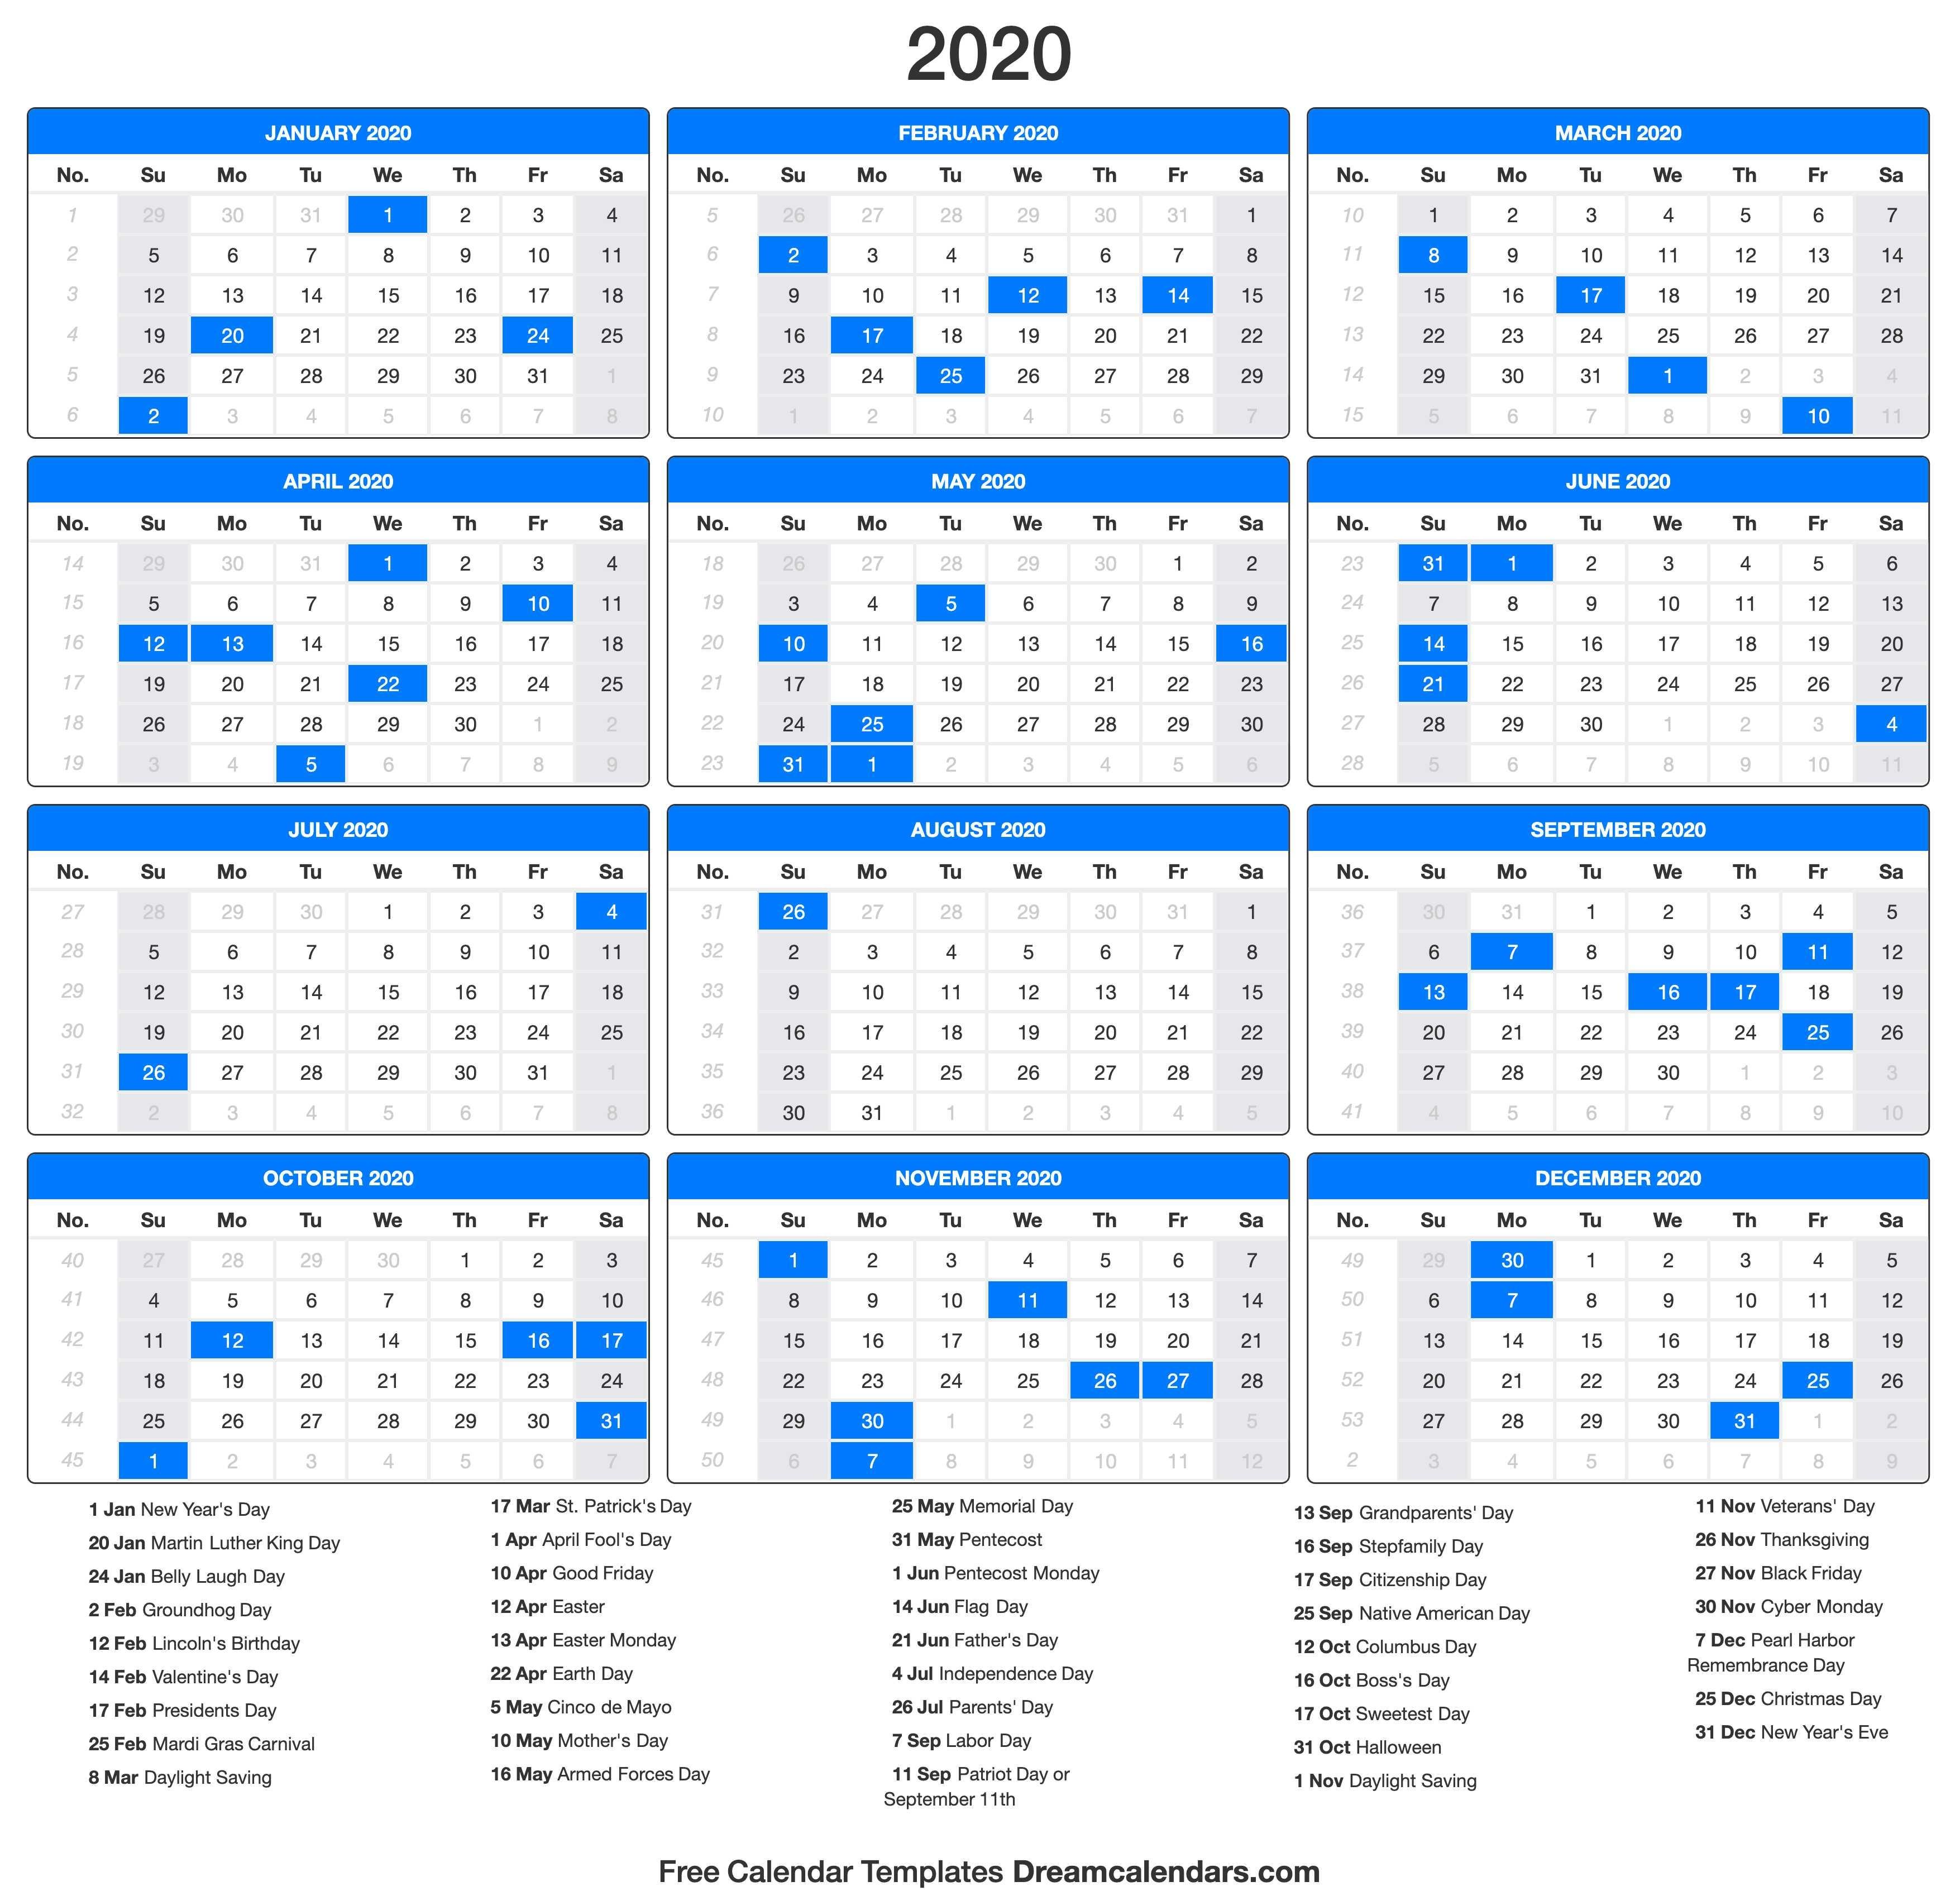 2020 Calendar with Holidays Printable 2020 Calendar